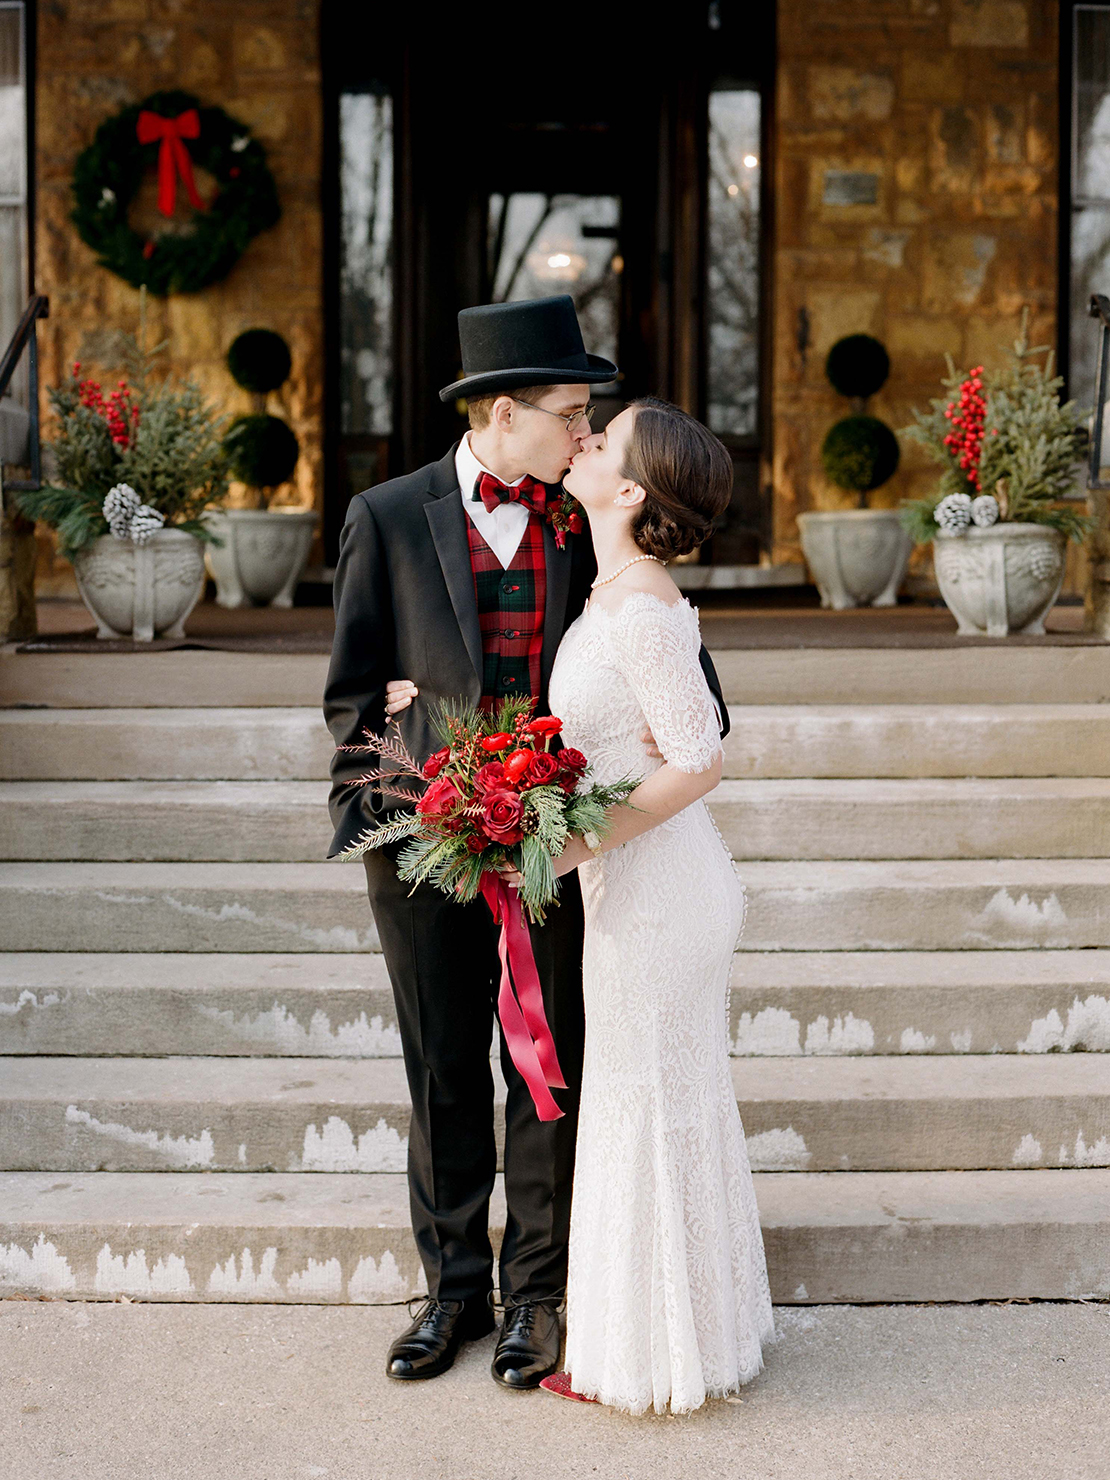 Heidi Vail Photography | Winter Wedding Kiss at Summit Manor Reception House, Saint Paul, Minnesota | Destination Fine Art Wedding Photographer | Based in Orlando, Florida